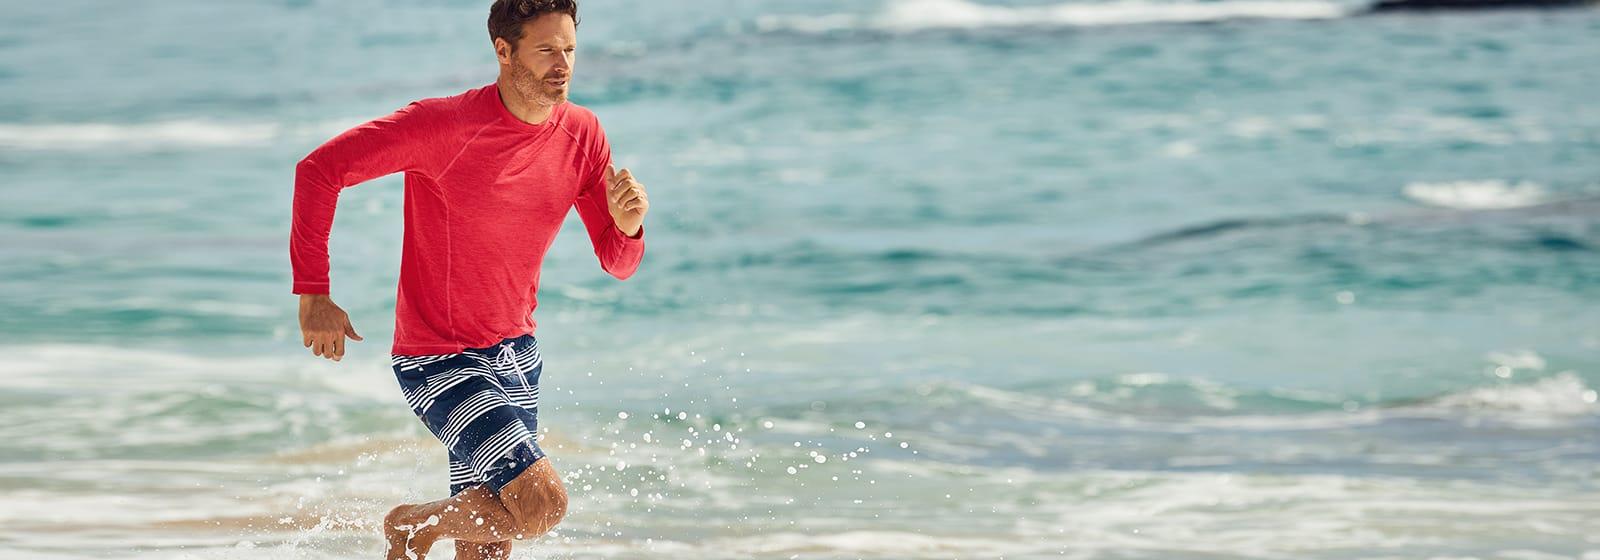 Are Board Shorts the Same as Swim Trunks? Board Shorts vs Swim Trunks